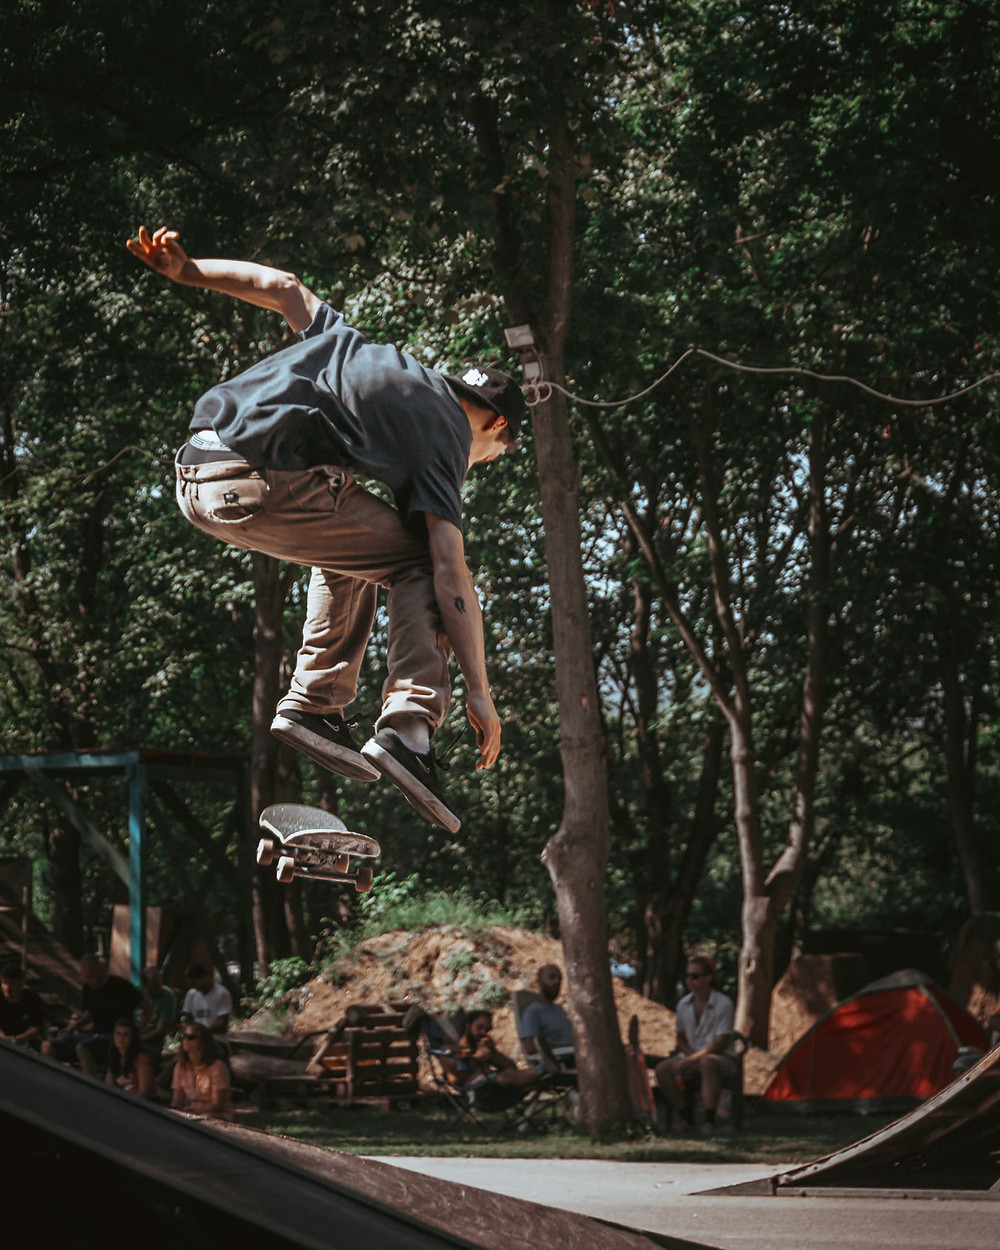 Mihi hardflip  | PEEX 2020 | Fotó: Stég Skateboarding | Smirgli